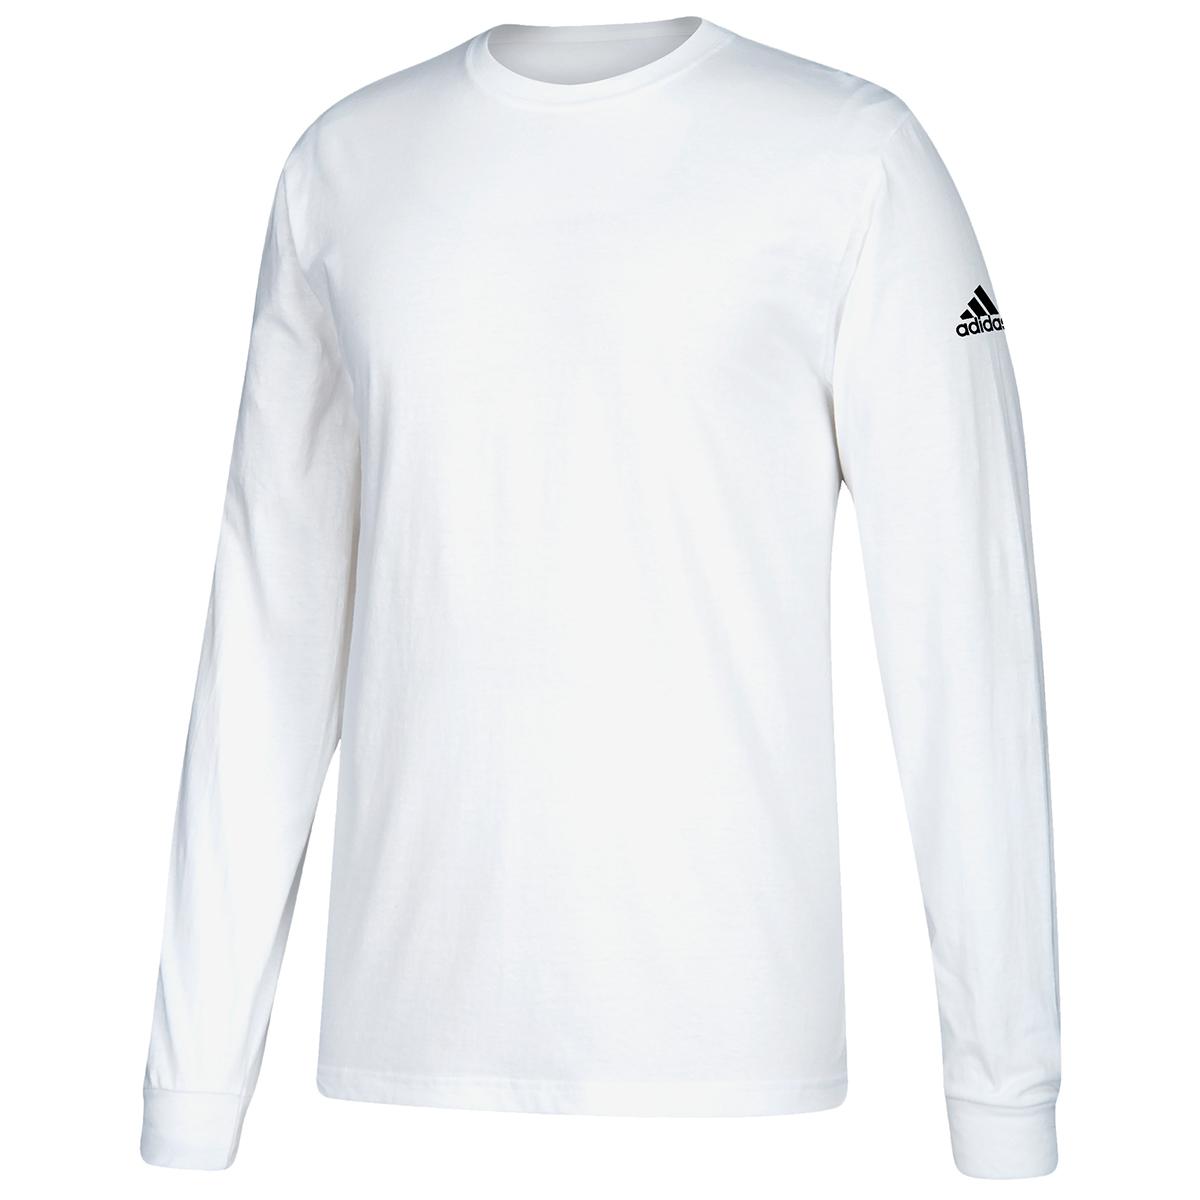 Adidas Men's Performance Long-Sleeve Tee - White, S